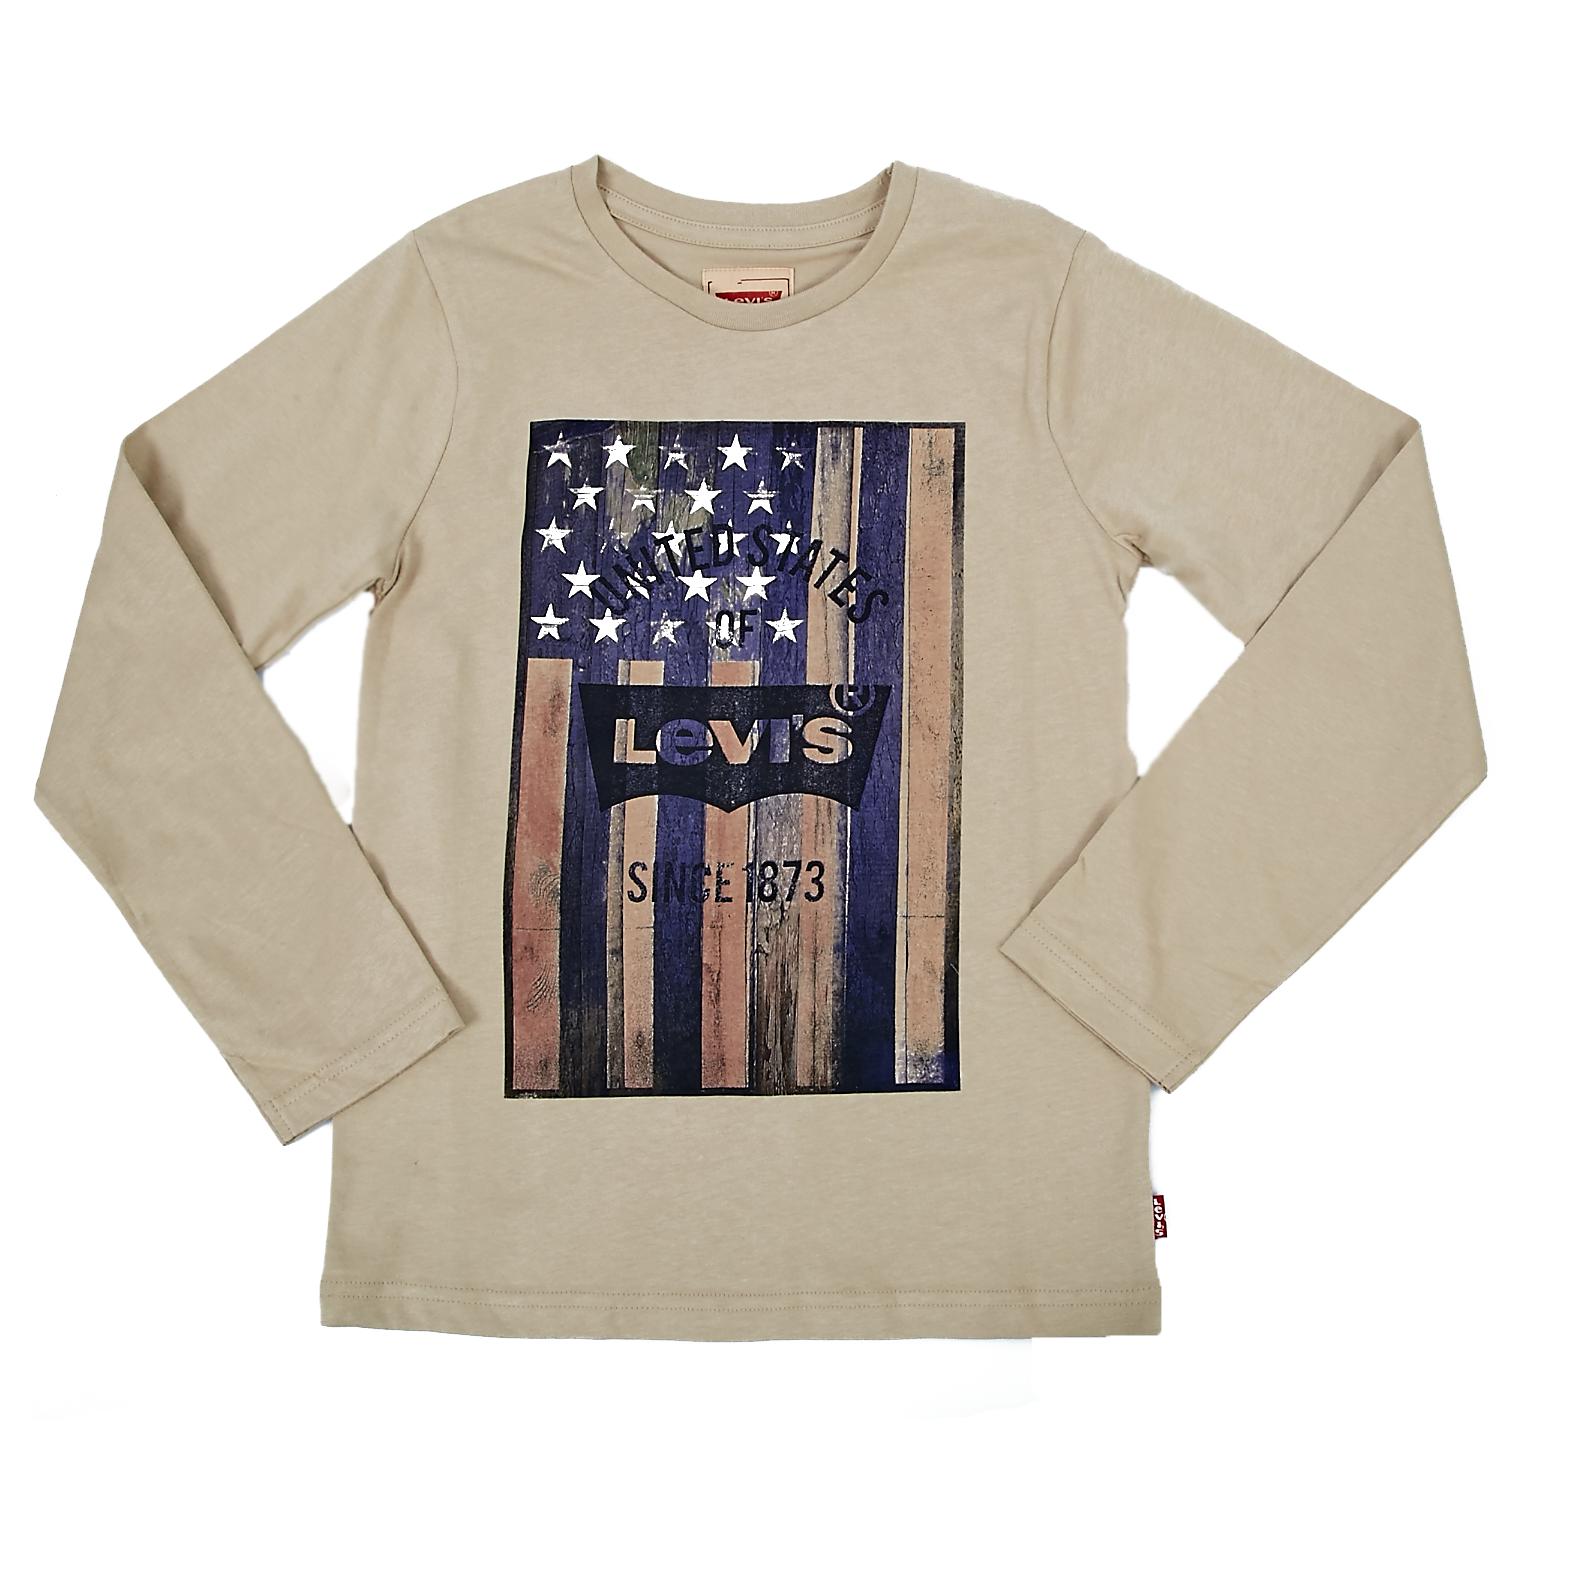 LEVI'S KIDS - Παιδική μπλούζα Levi's Kids μπεζ